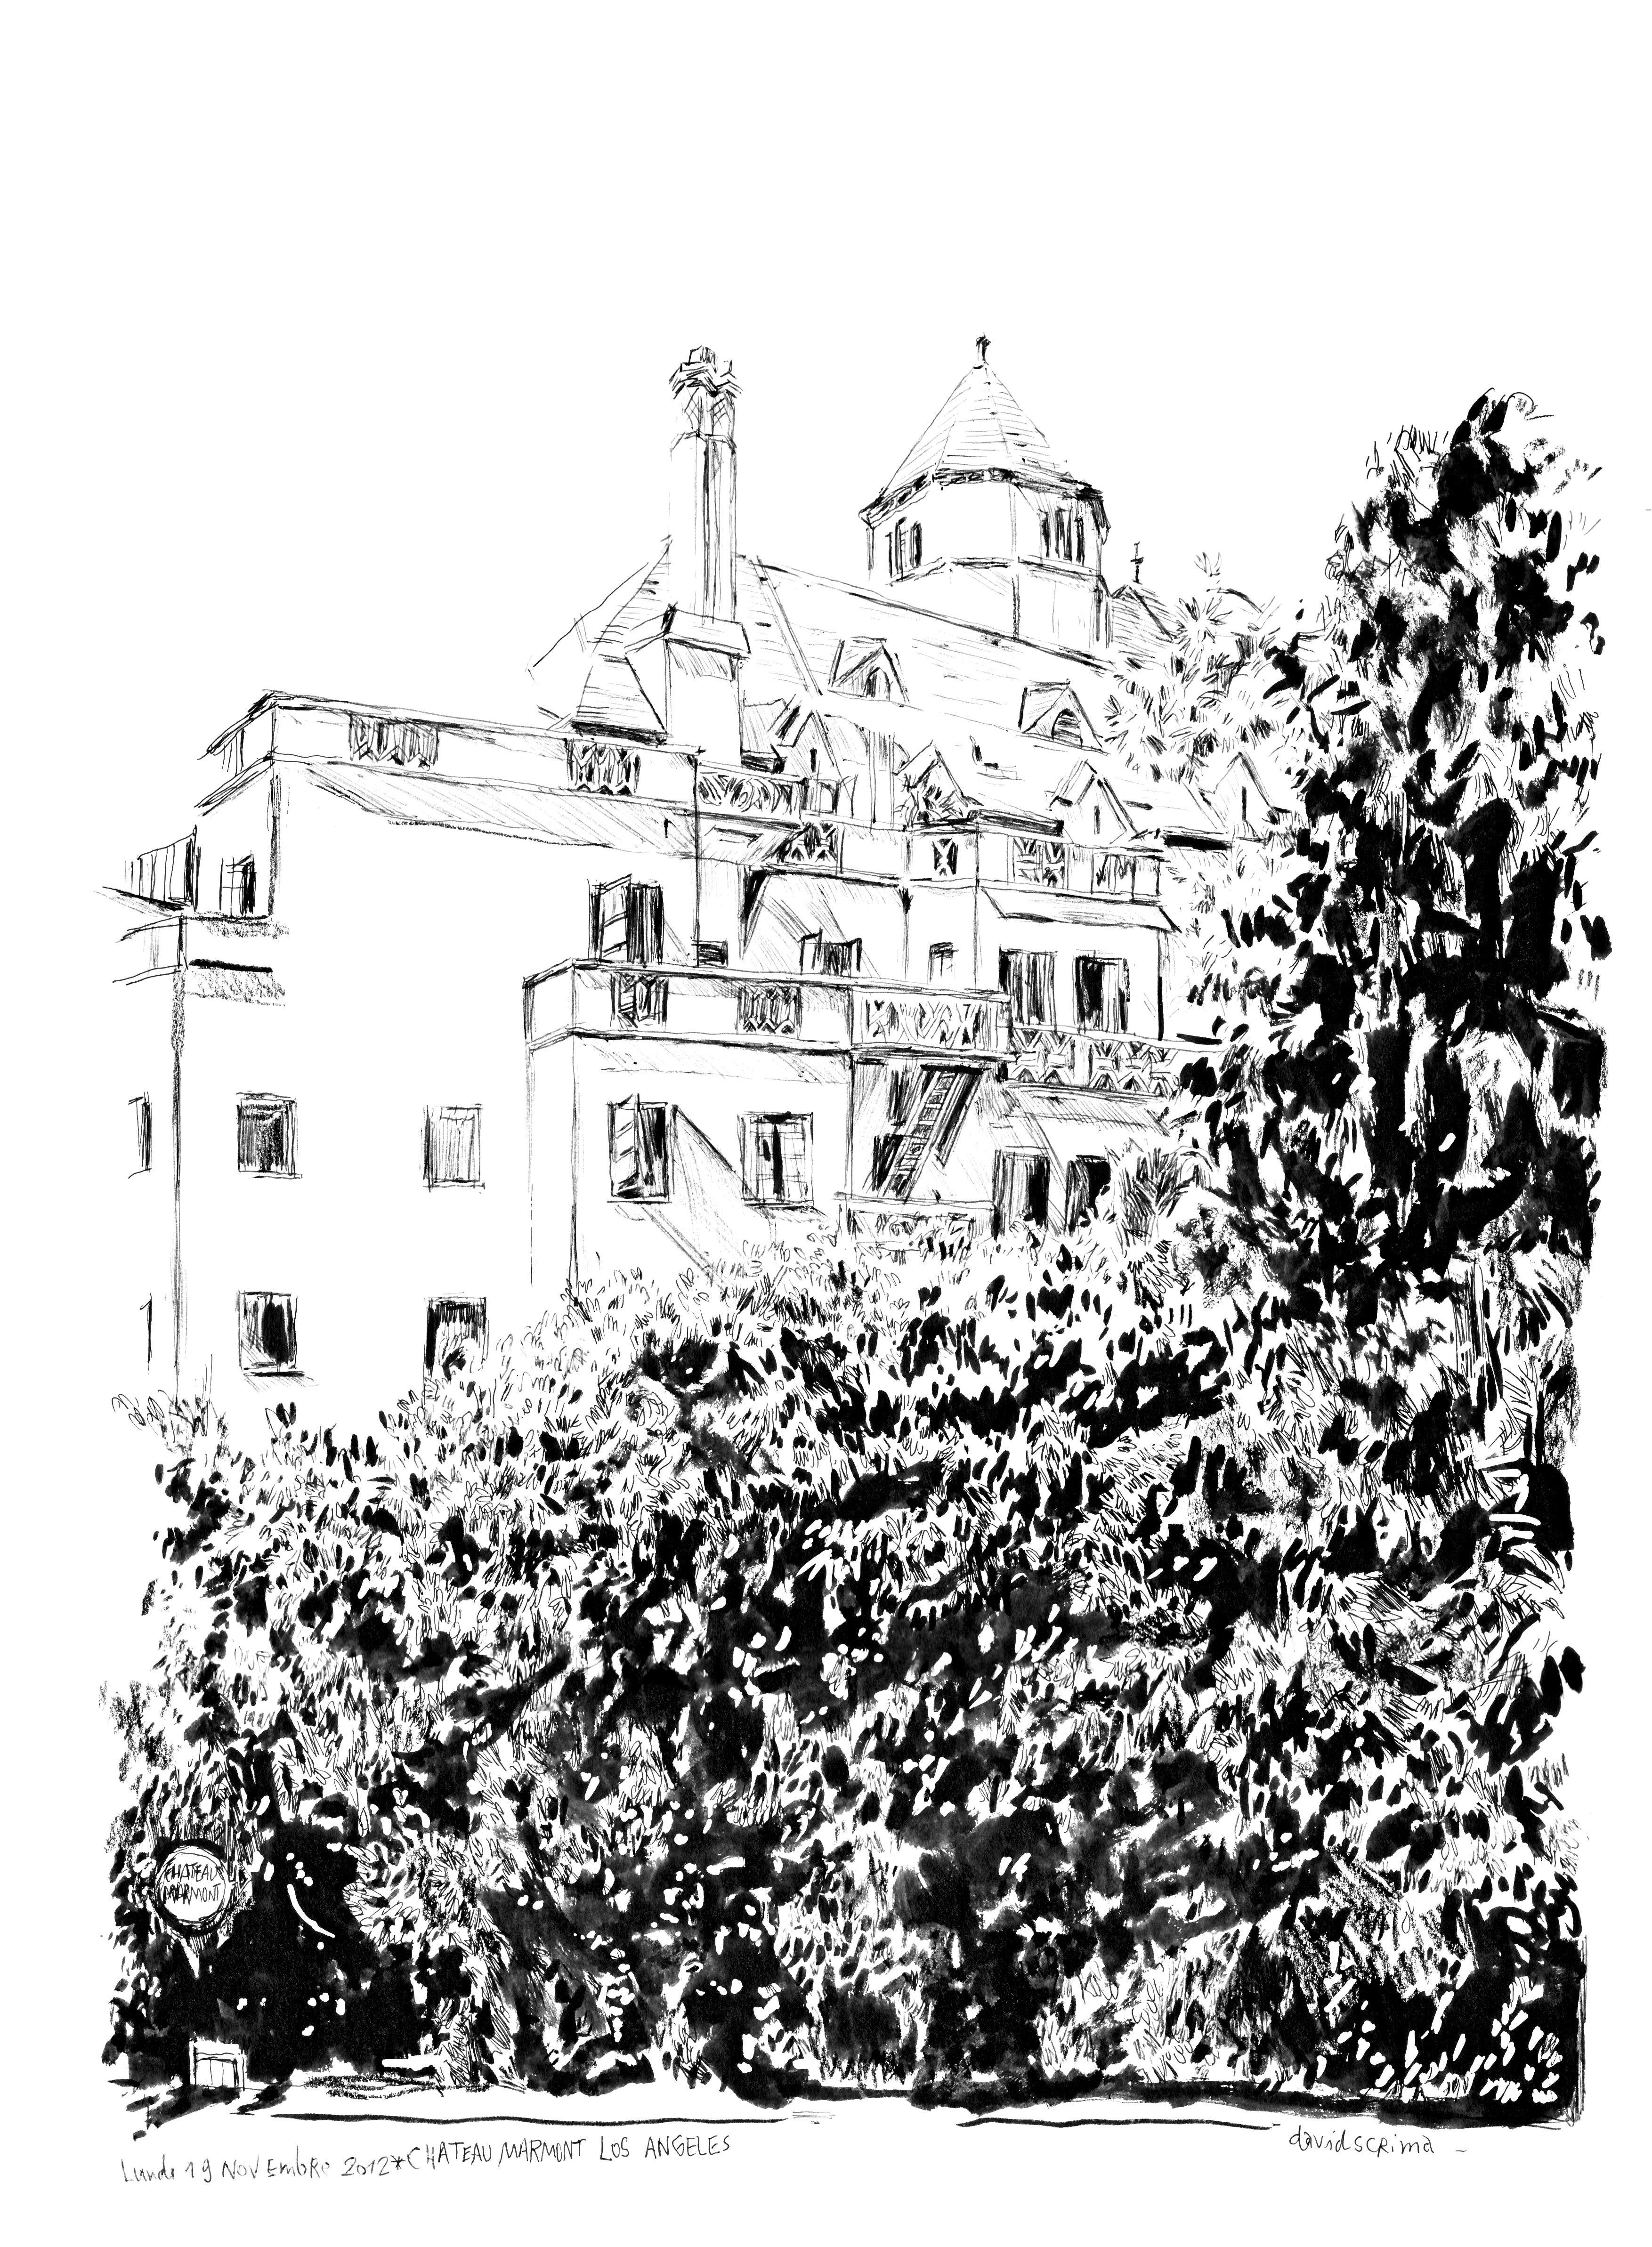 chateau Marmont http://davidscrima.wordpress.com/2012/11/30/chateau-marmont-los-angeles/